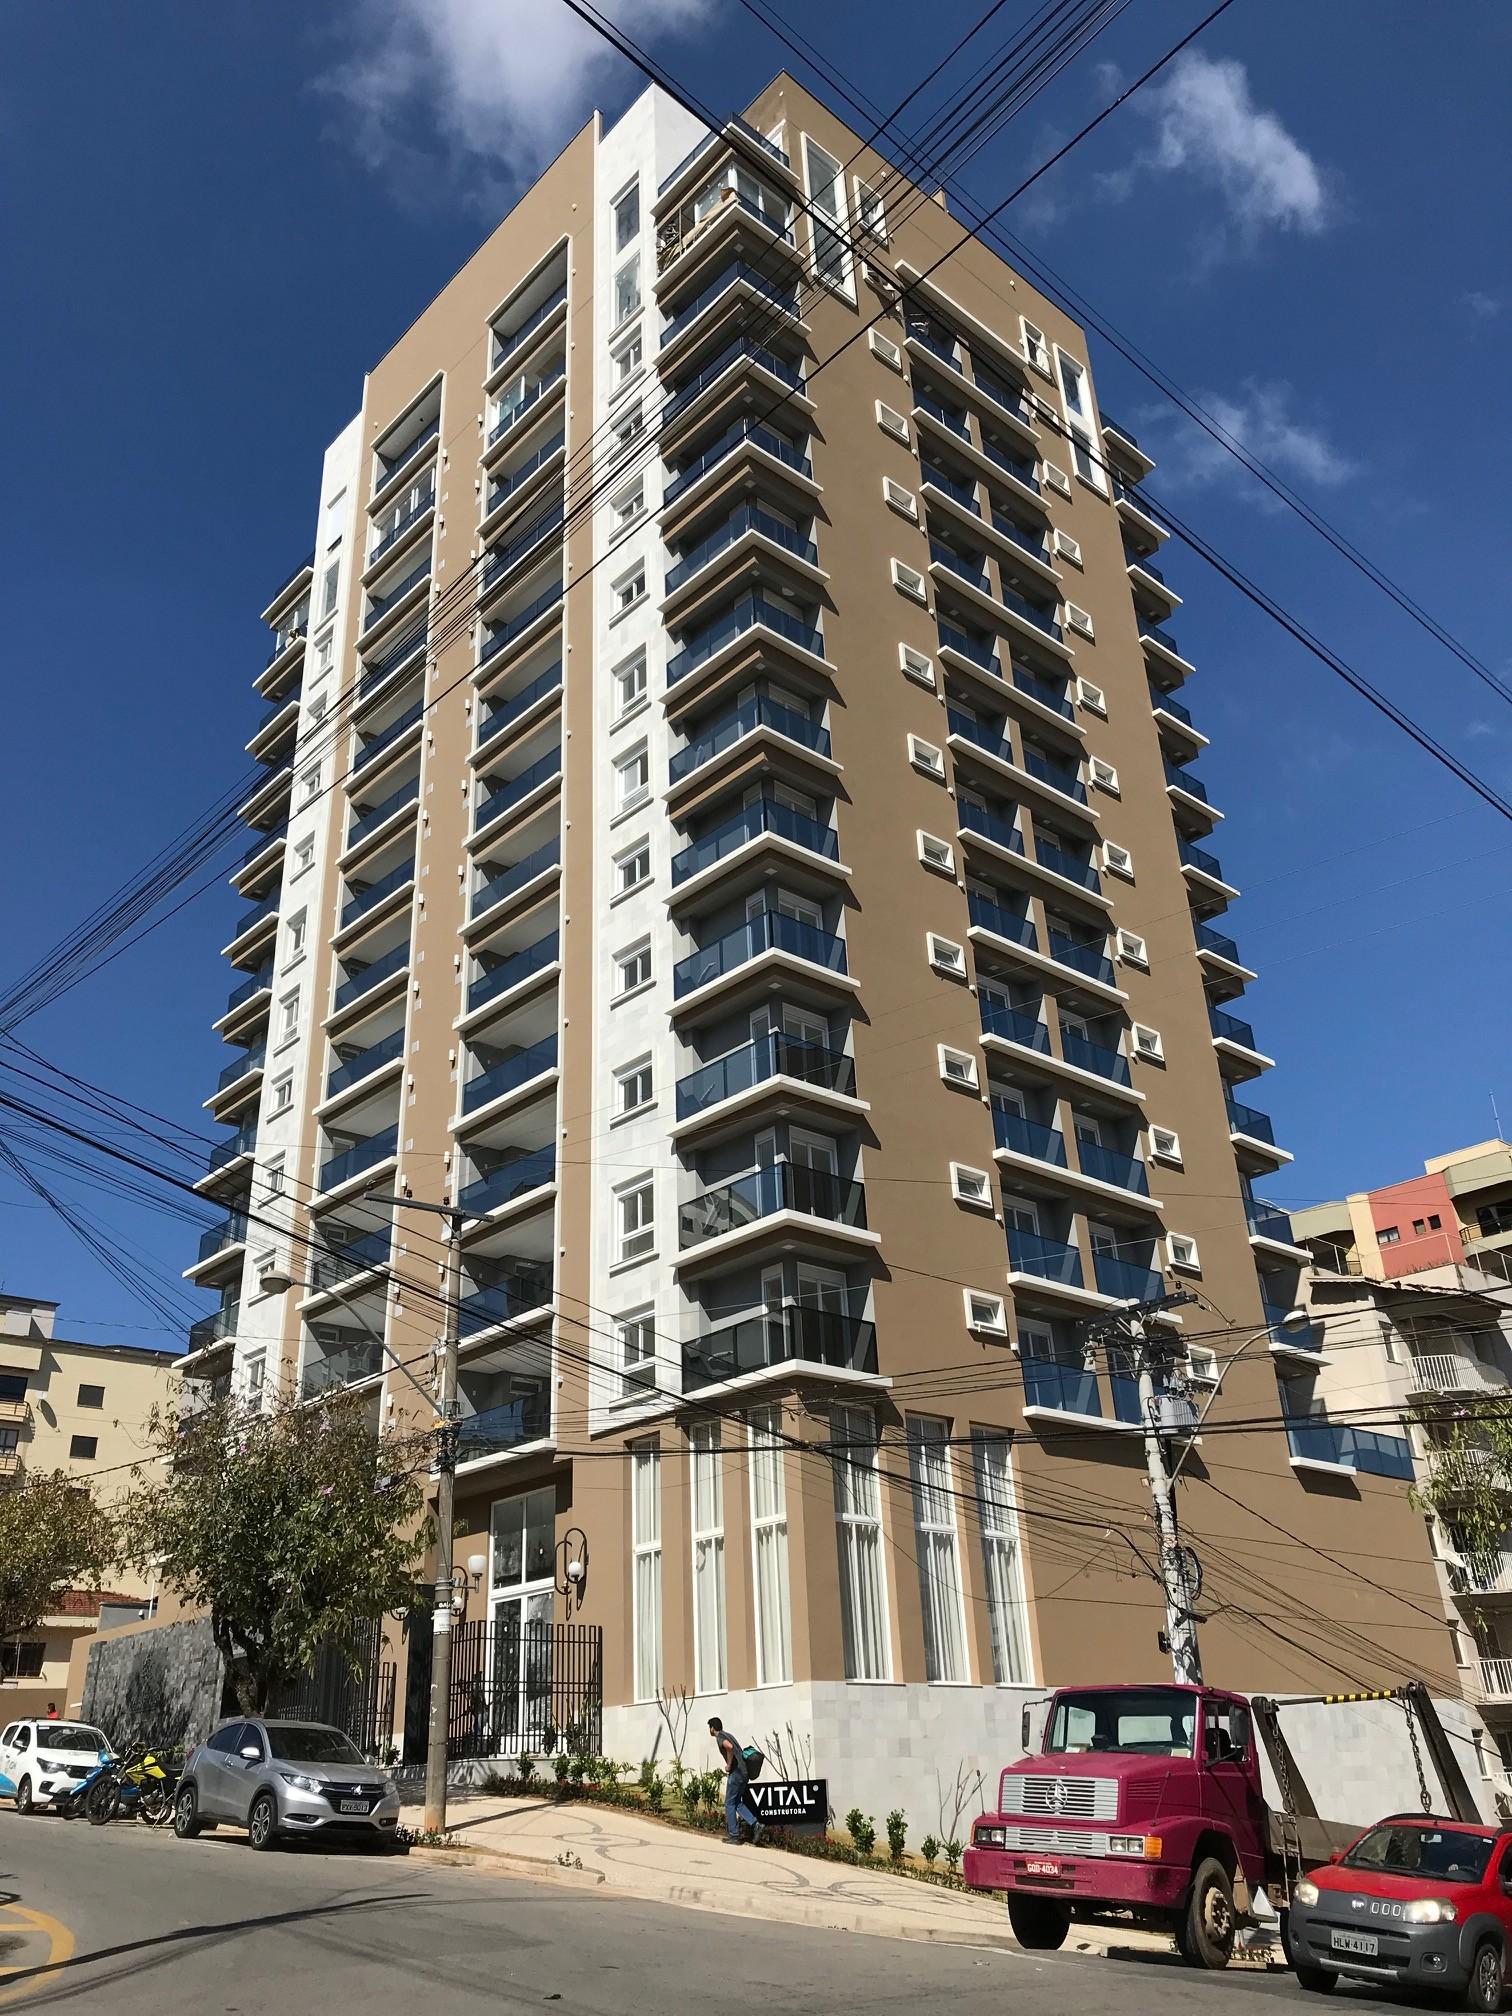 Cód 1649A -Lindo Apartamento ( novo) próximo ao centro.